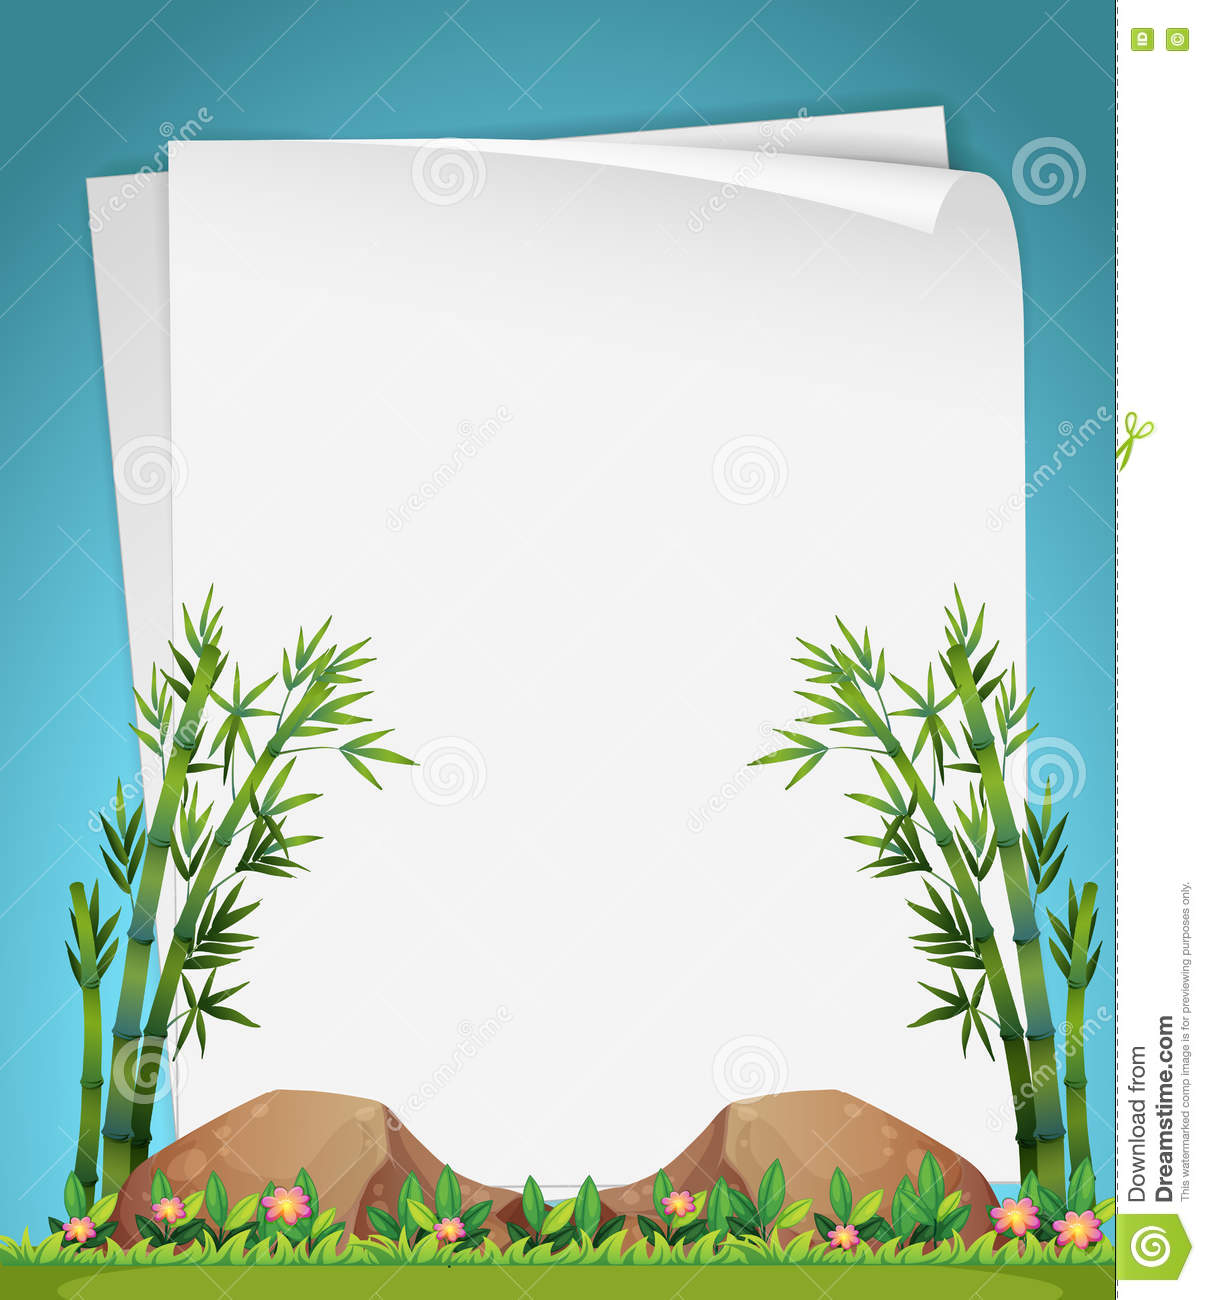 Paper Design With Bamboo In Garden Stock Vector.